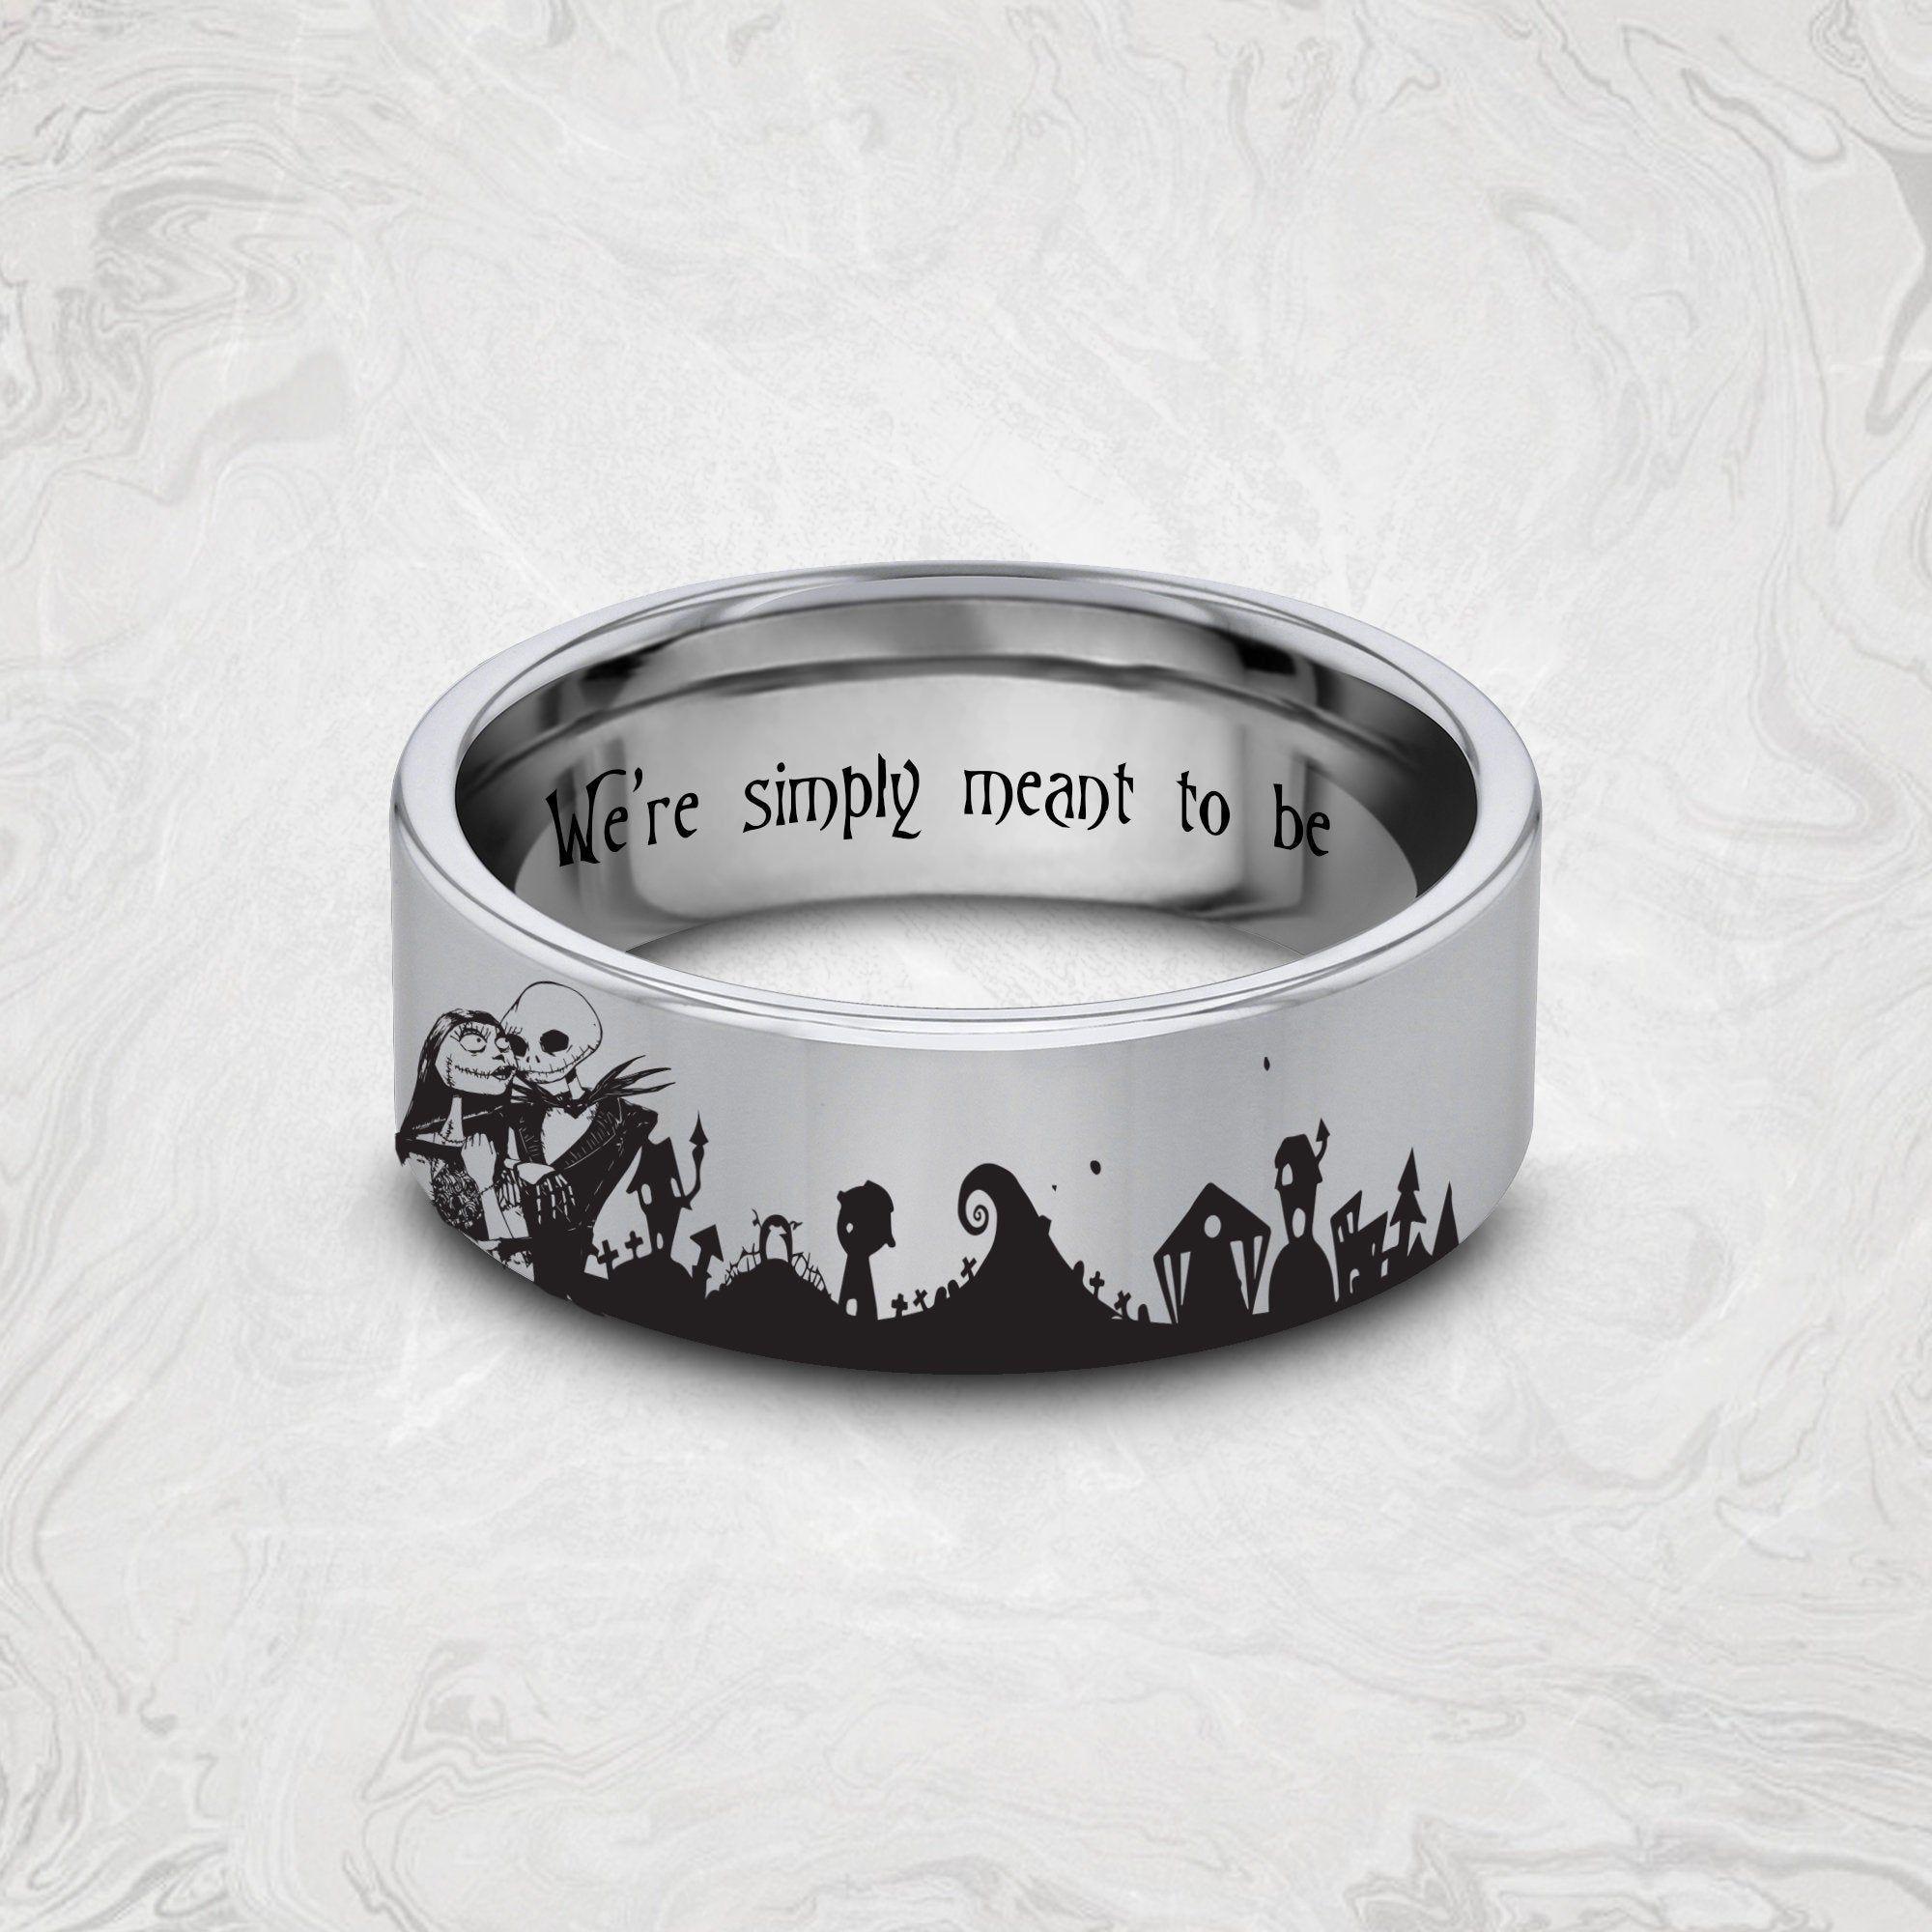 Disney Engagement Ring Jack And Sally Wedding Ring Nightmare Befo In 2020 Disney Engagement Rings Nightmare Before Christmas Rings Nightmare Before Christmas Jewelry